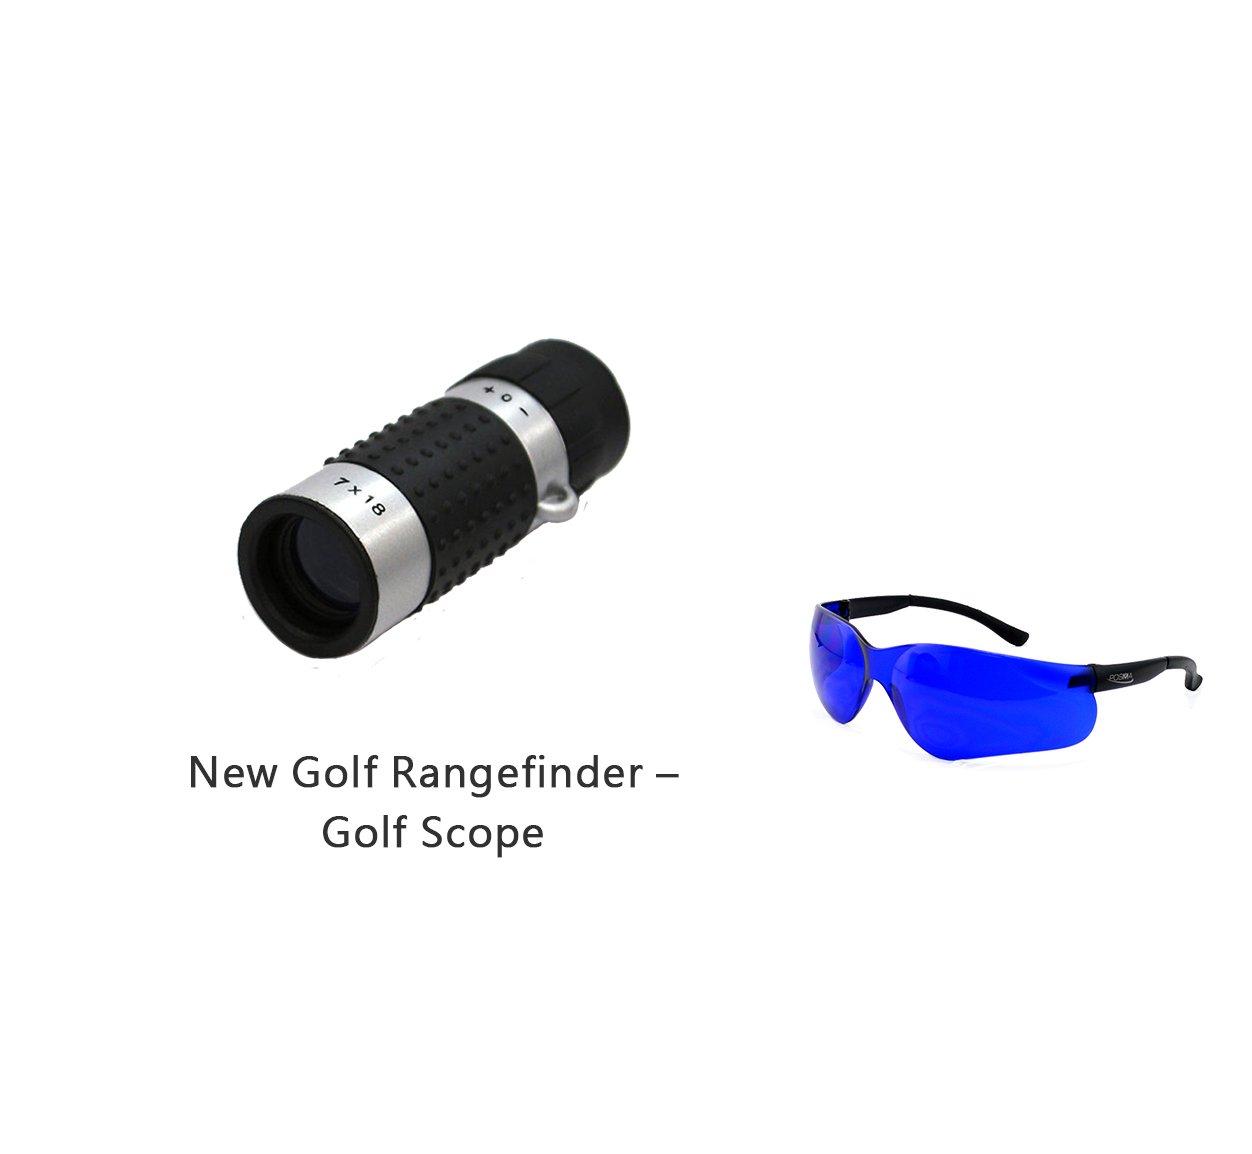 Posma GF100C Bundle set Golf Rangefinder High Definition Mini Monocular Pocket Scope + Golf Ball Finder Hunter Retriever Glasses